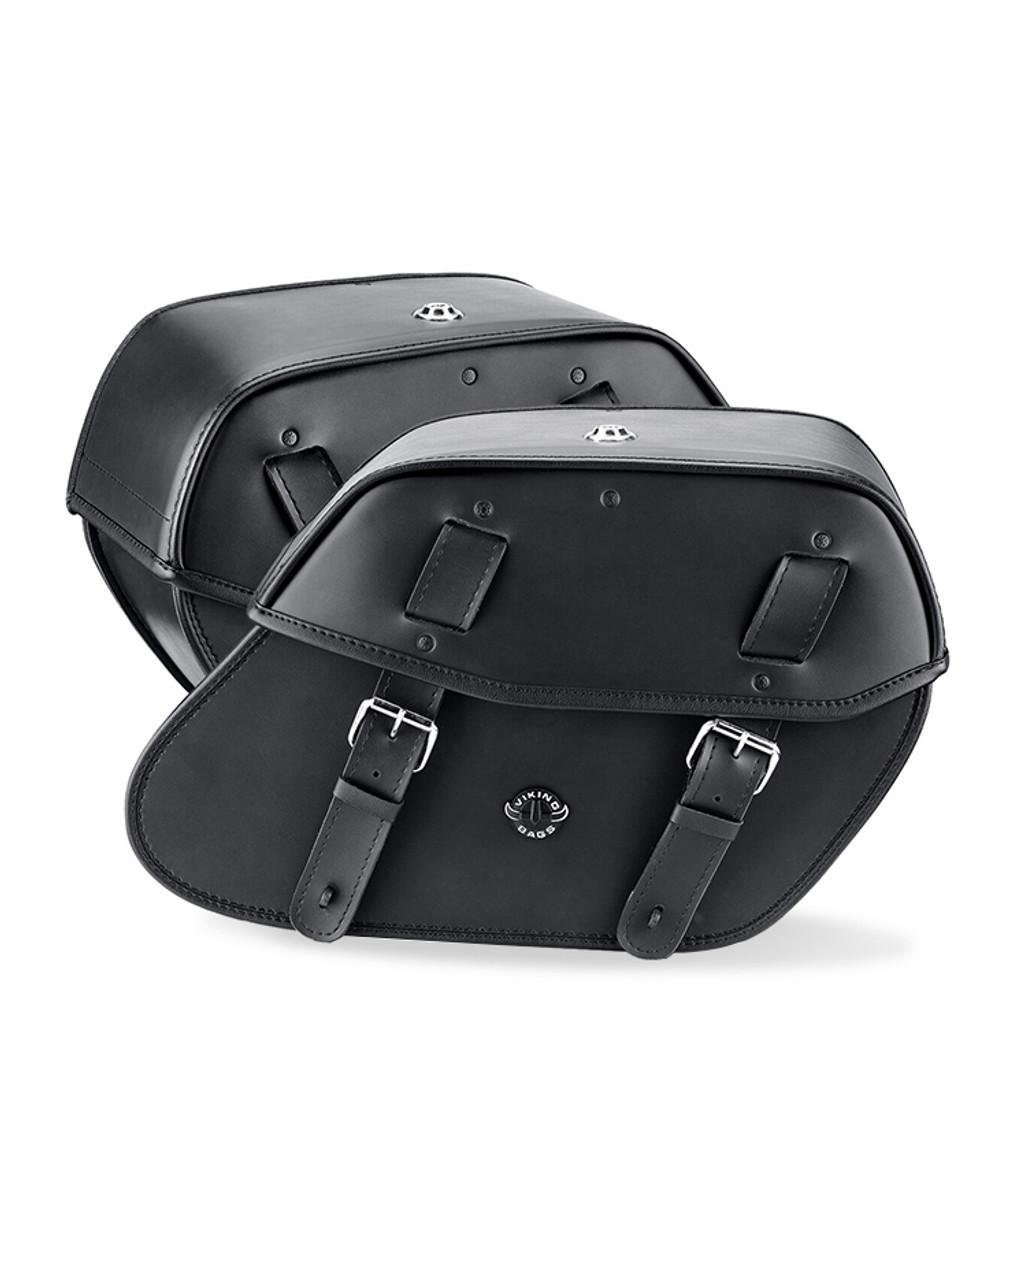 Indian Chief Standard Viking Odin Medium Motorcycle Saddlebags Both Bags View